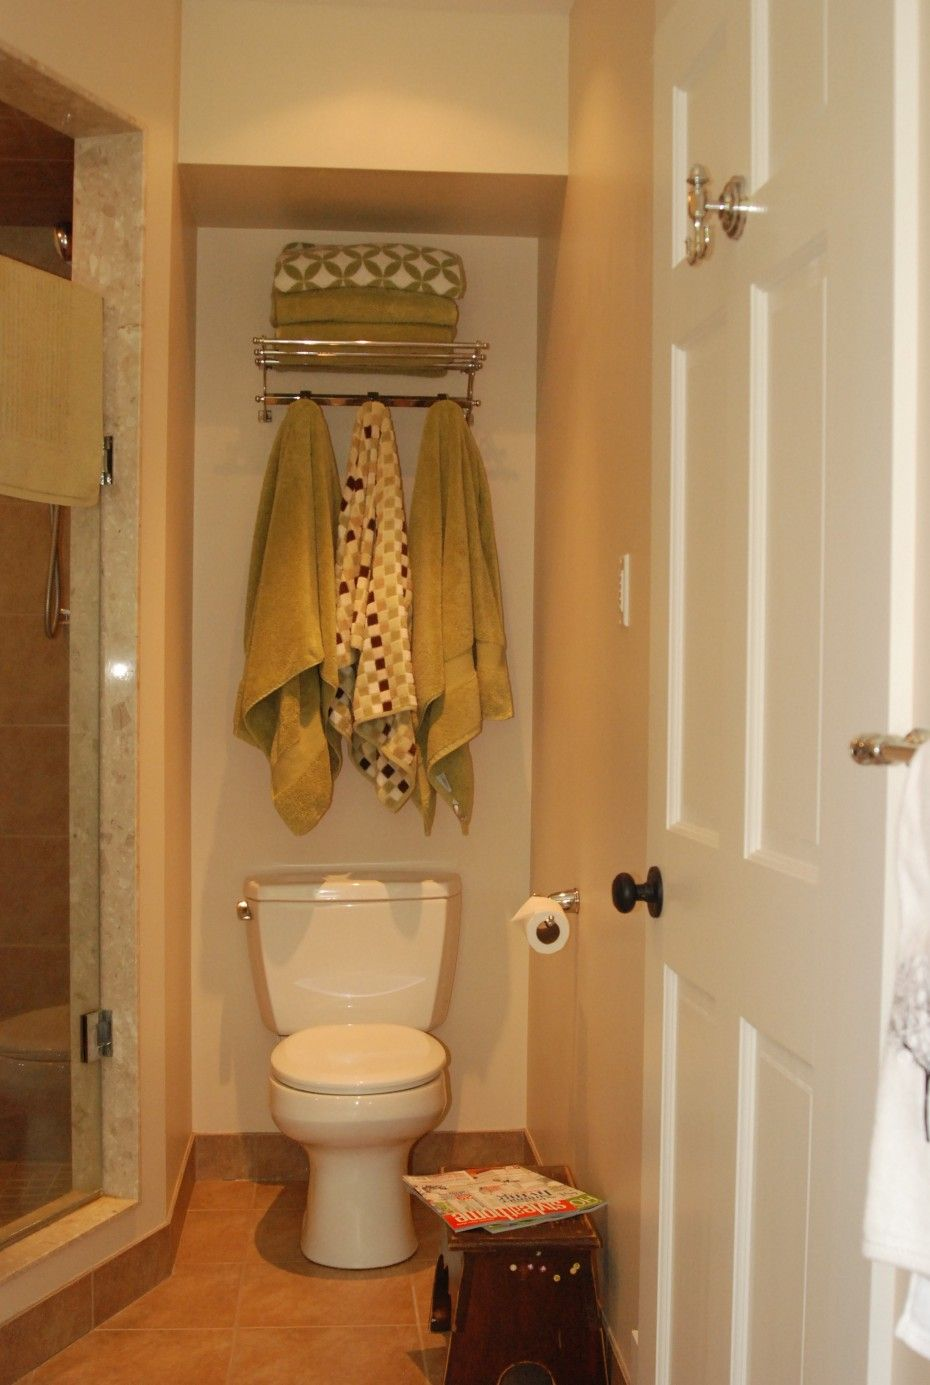 Bathroom Storage Popular Over Toilet Storage Bathroom Appliance Cabinet Pictures Appealing Custom Wall Mo Over Toilet Shelves Over Toilet Over Toilet Storage